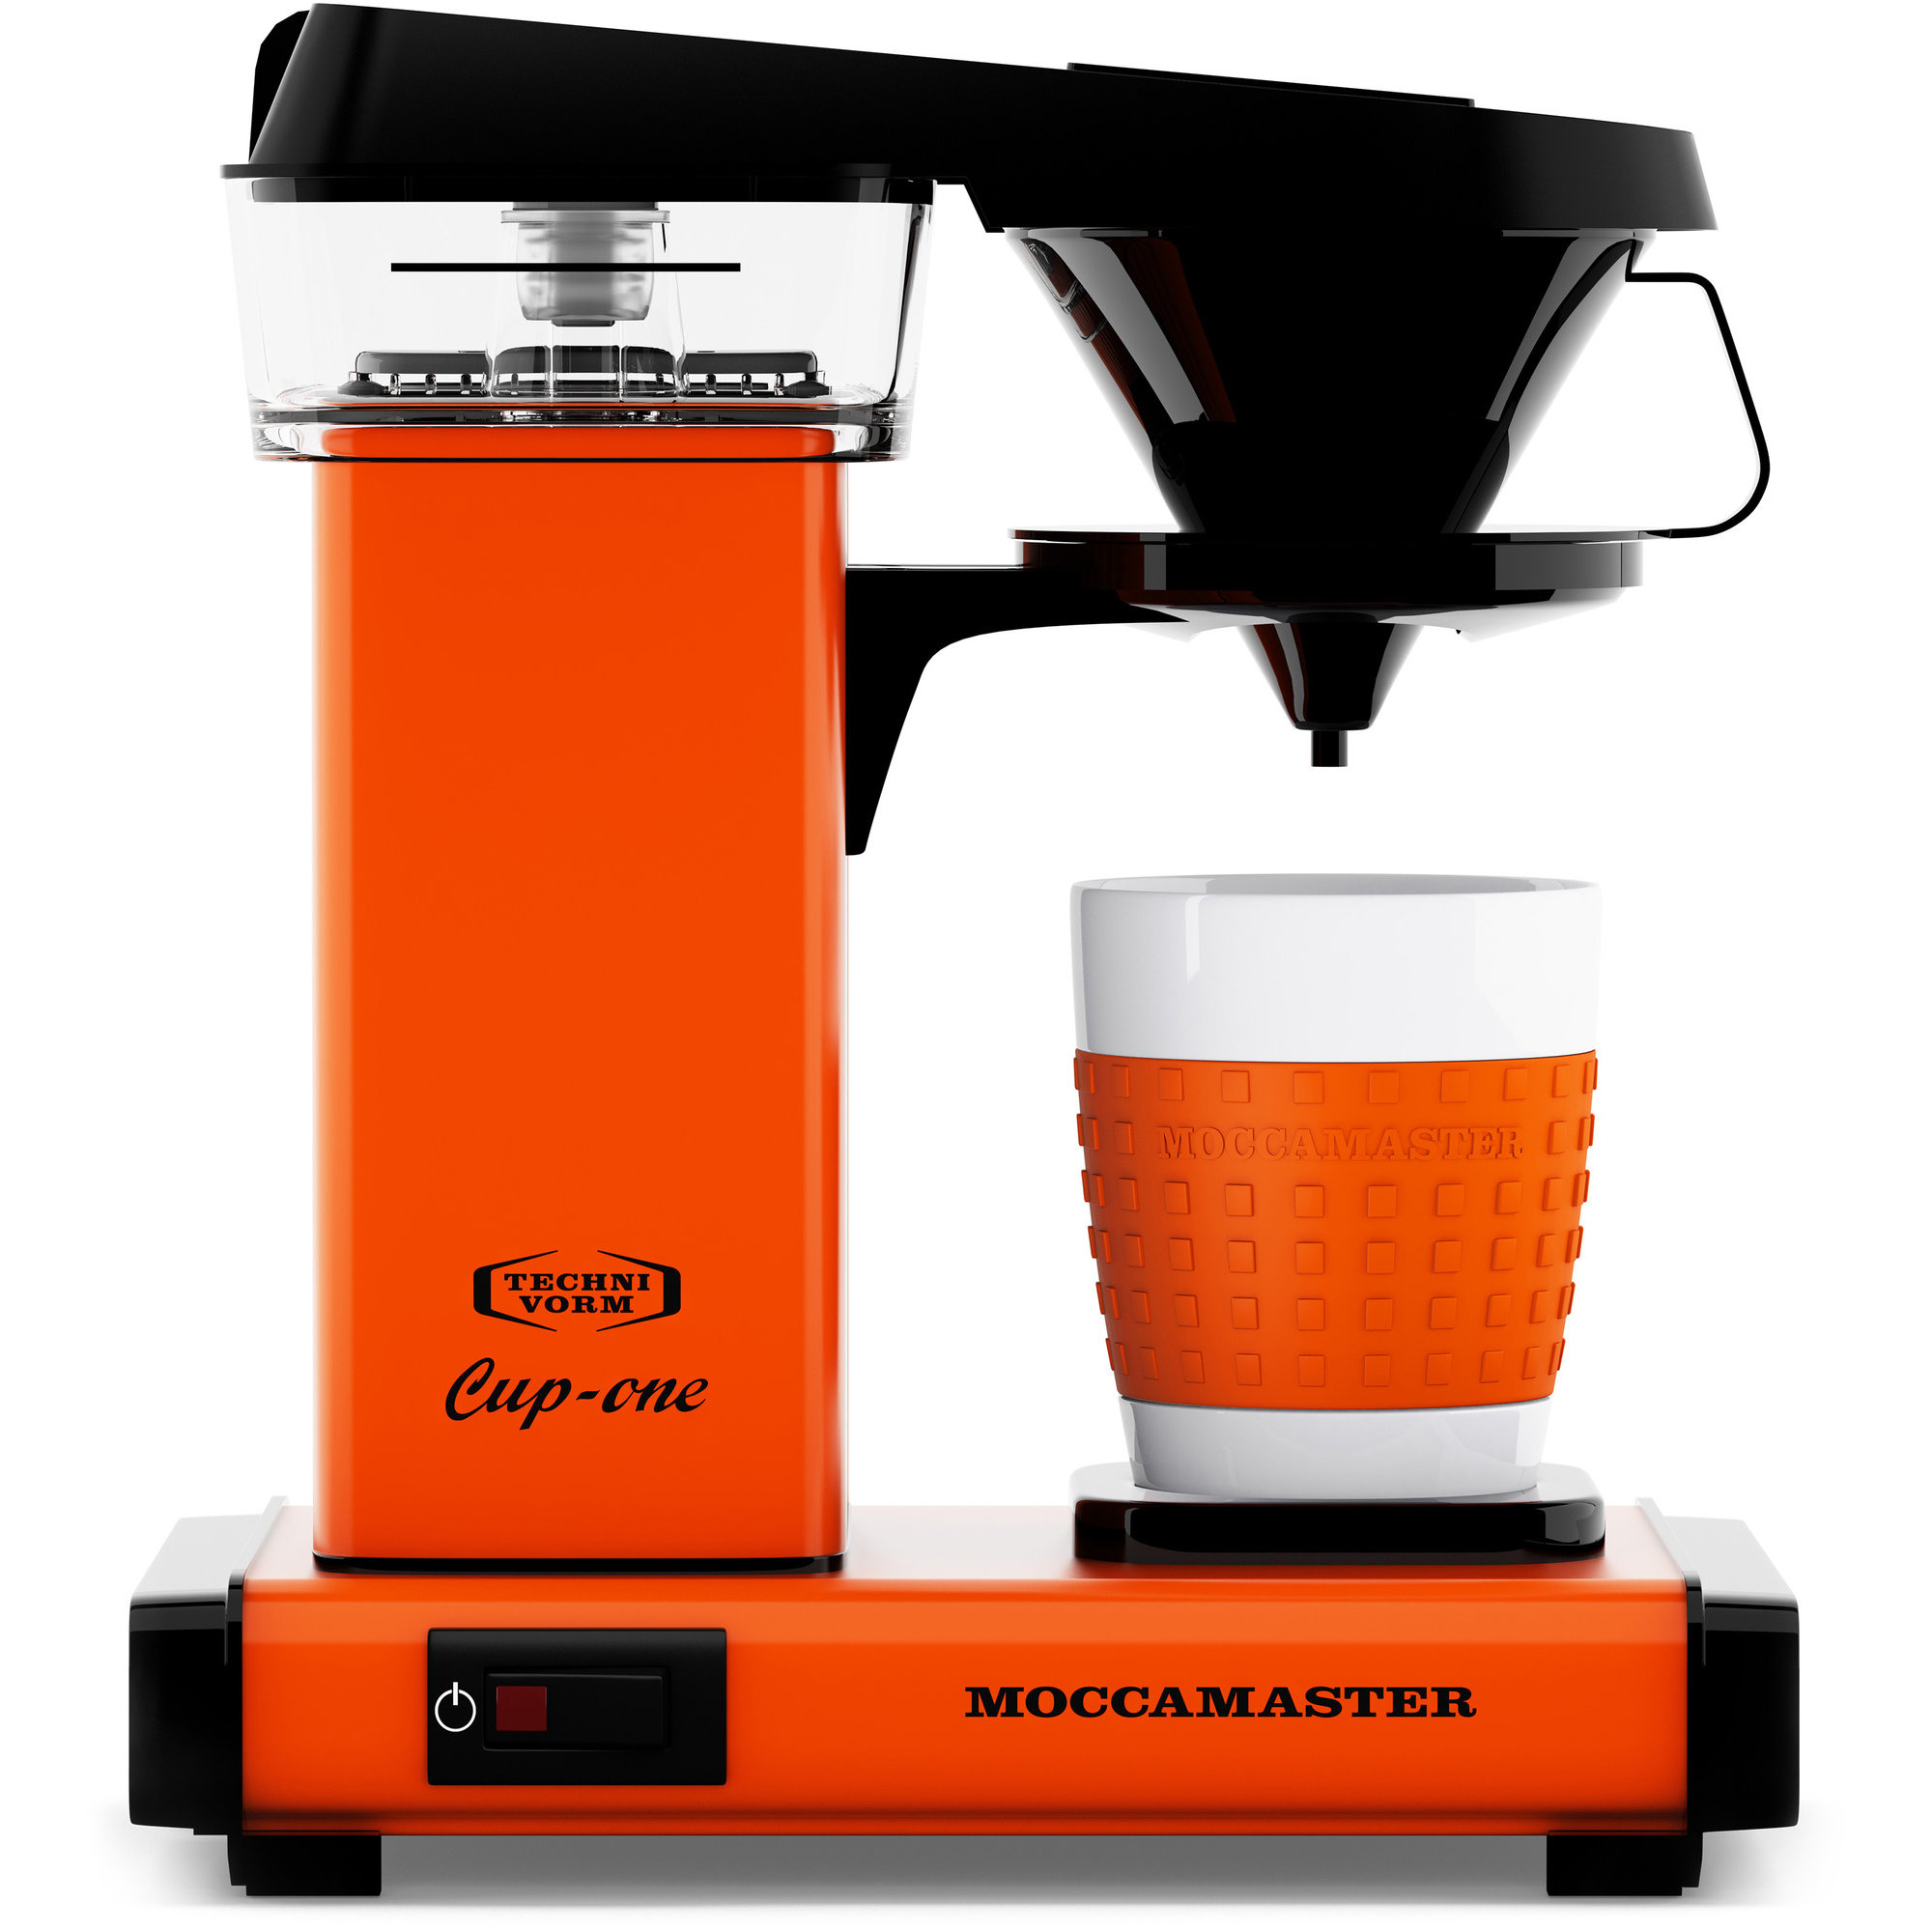 Moccamaster Kaffebryggare CUP ONE Orange